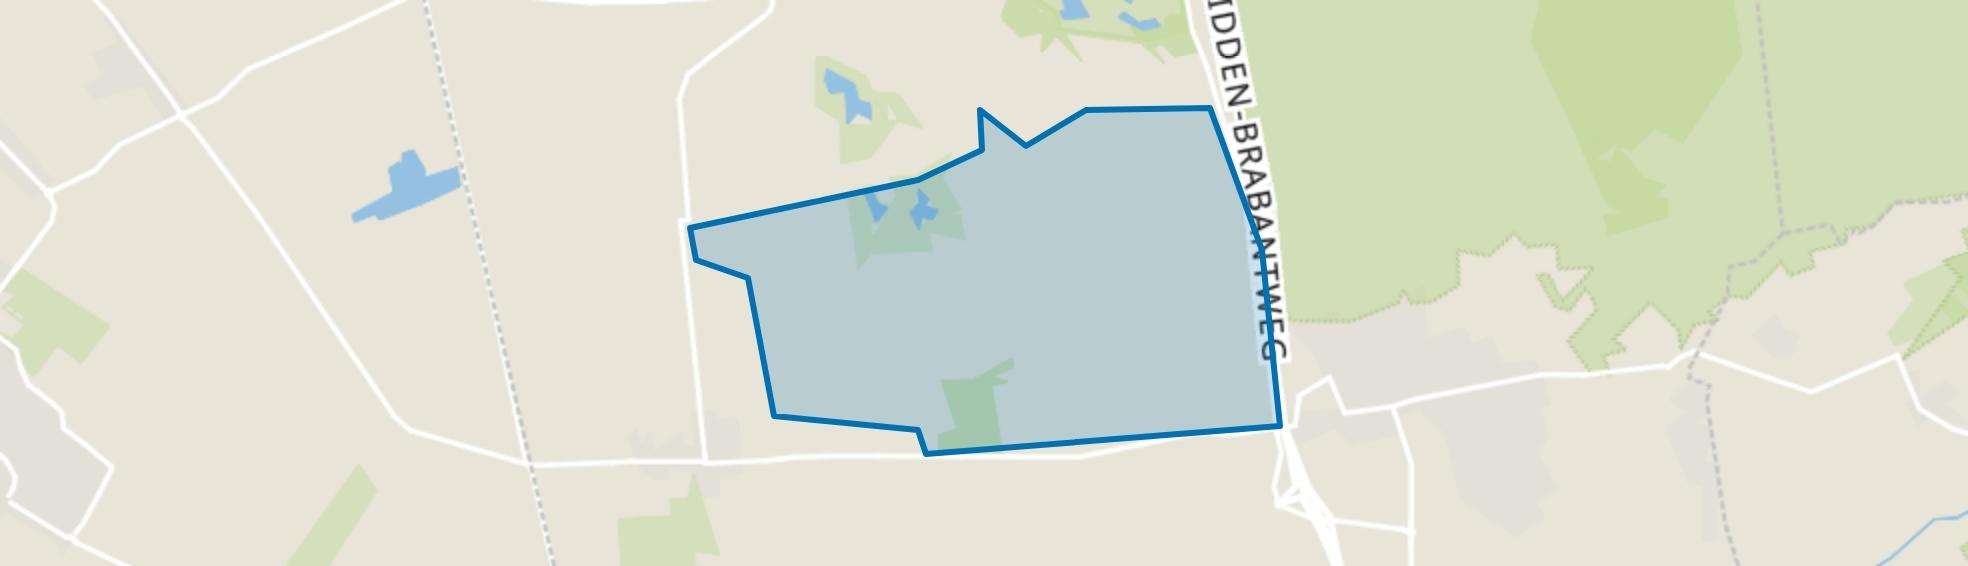 Bergeind, Loon op Zand map